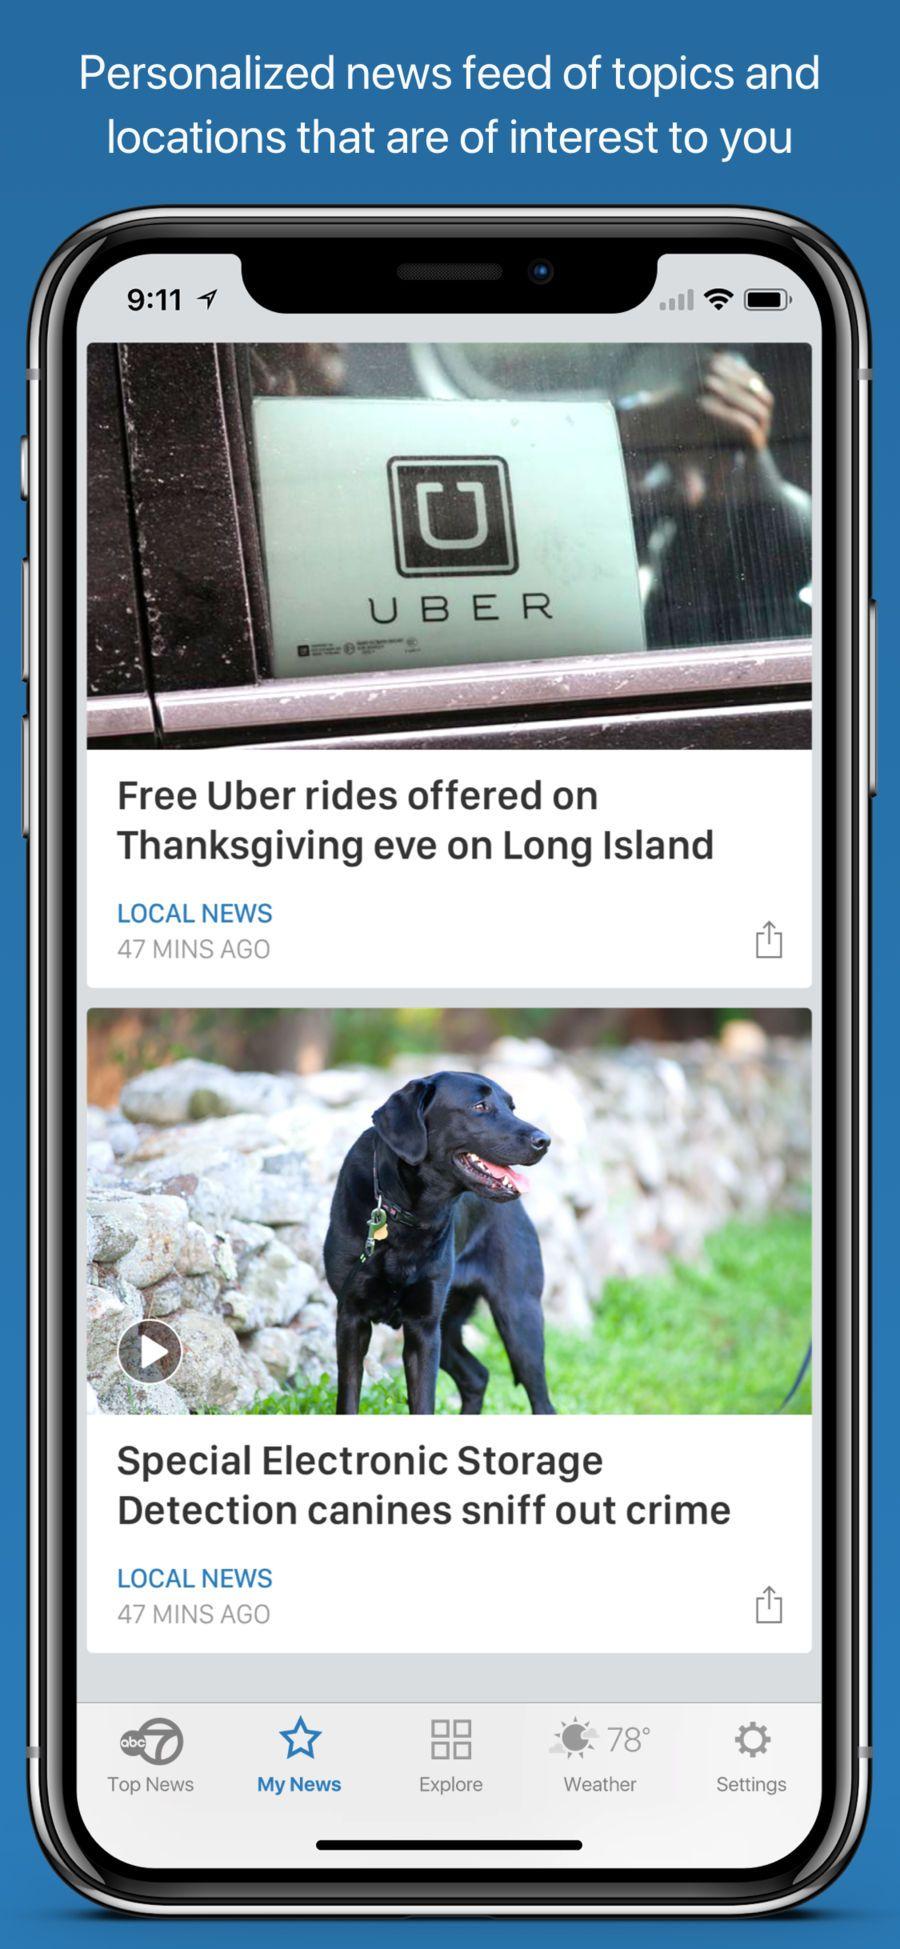 WABC Eyewitness News WeatherDigitalappsios Uber ride